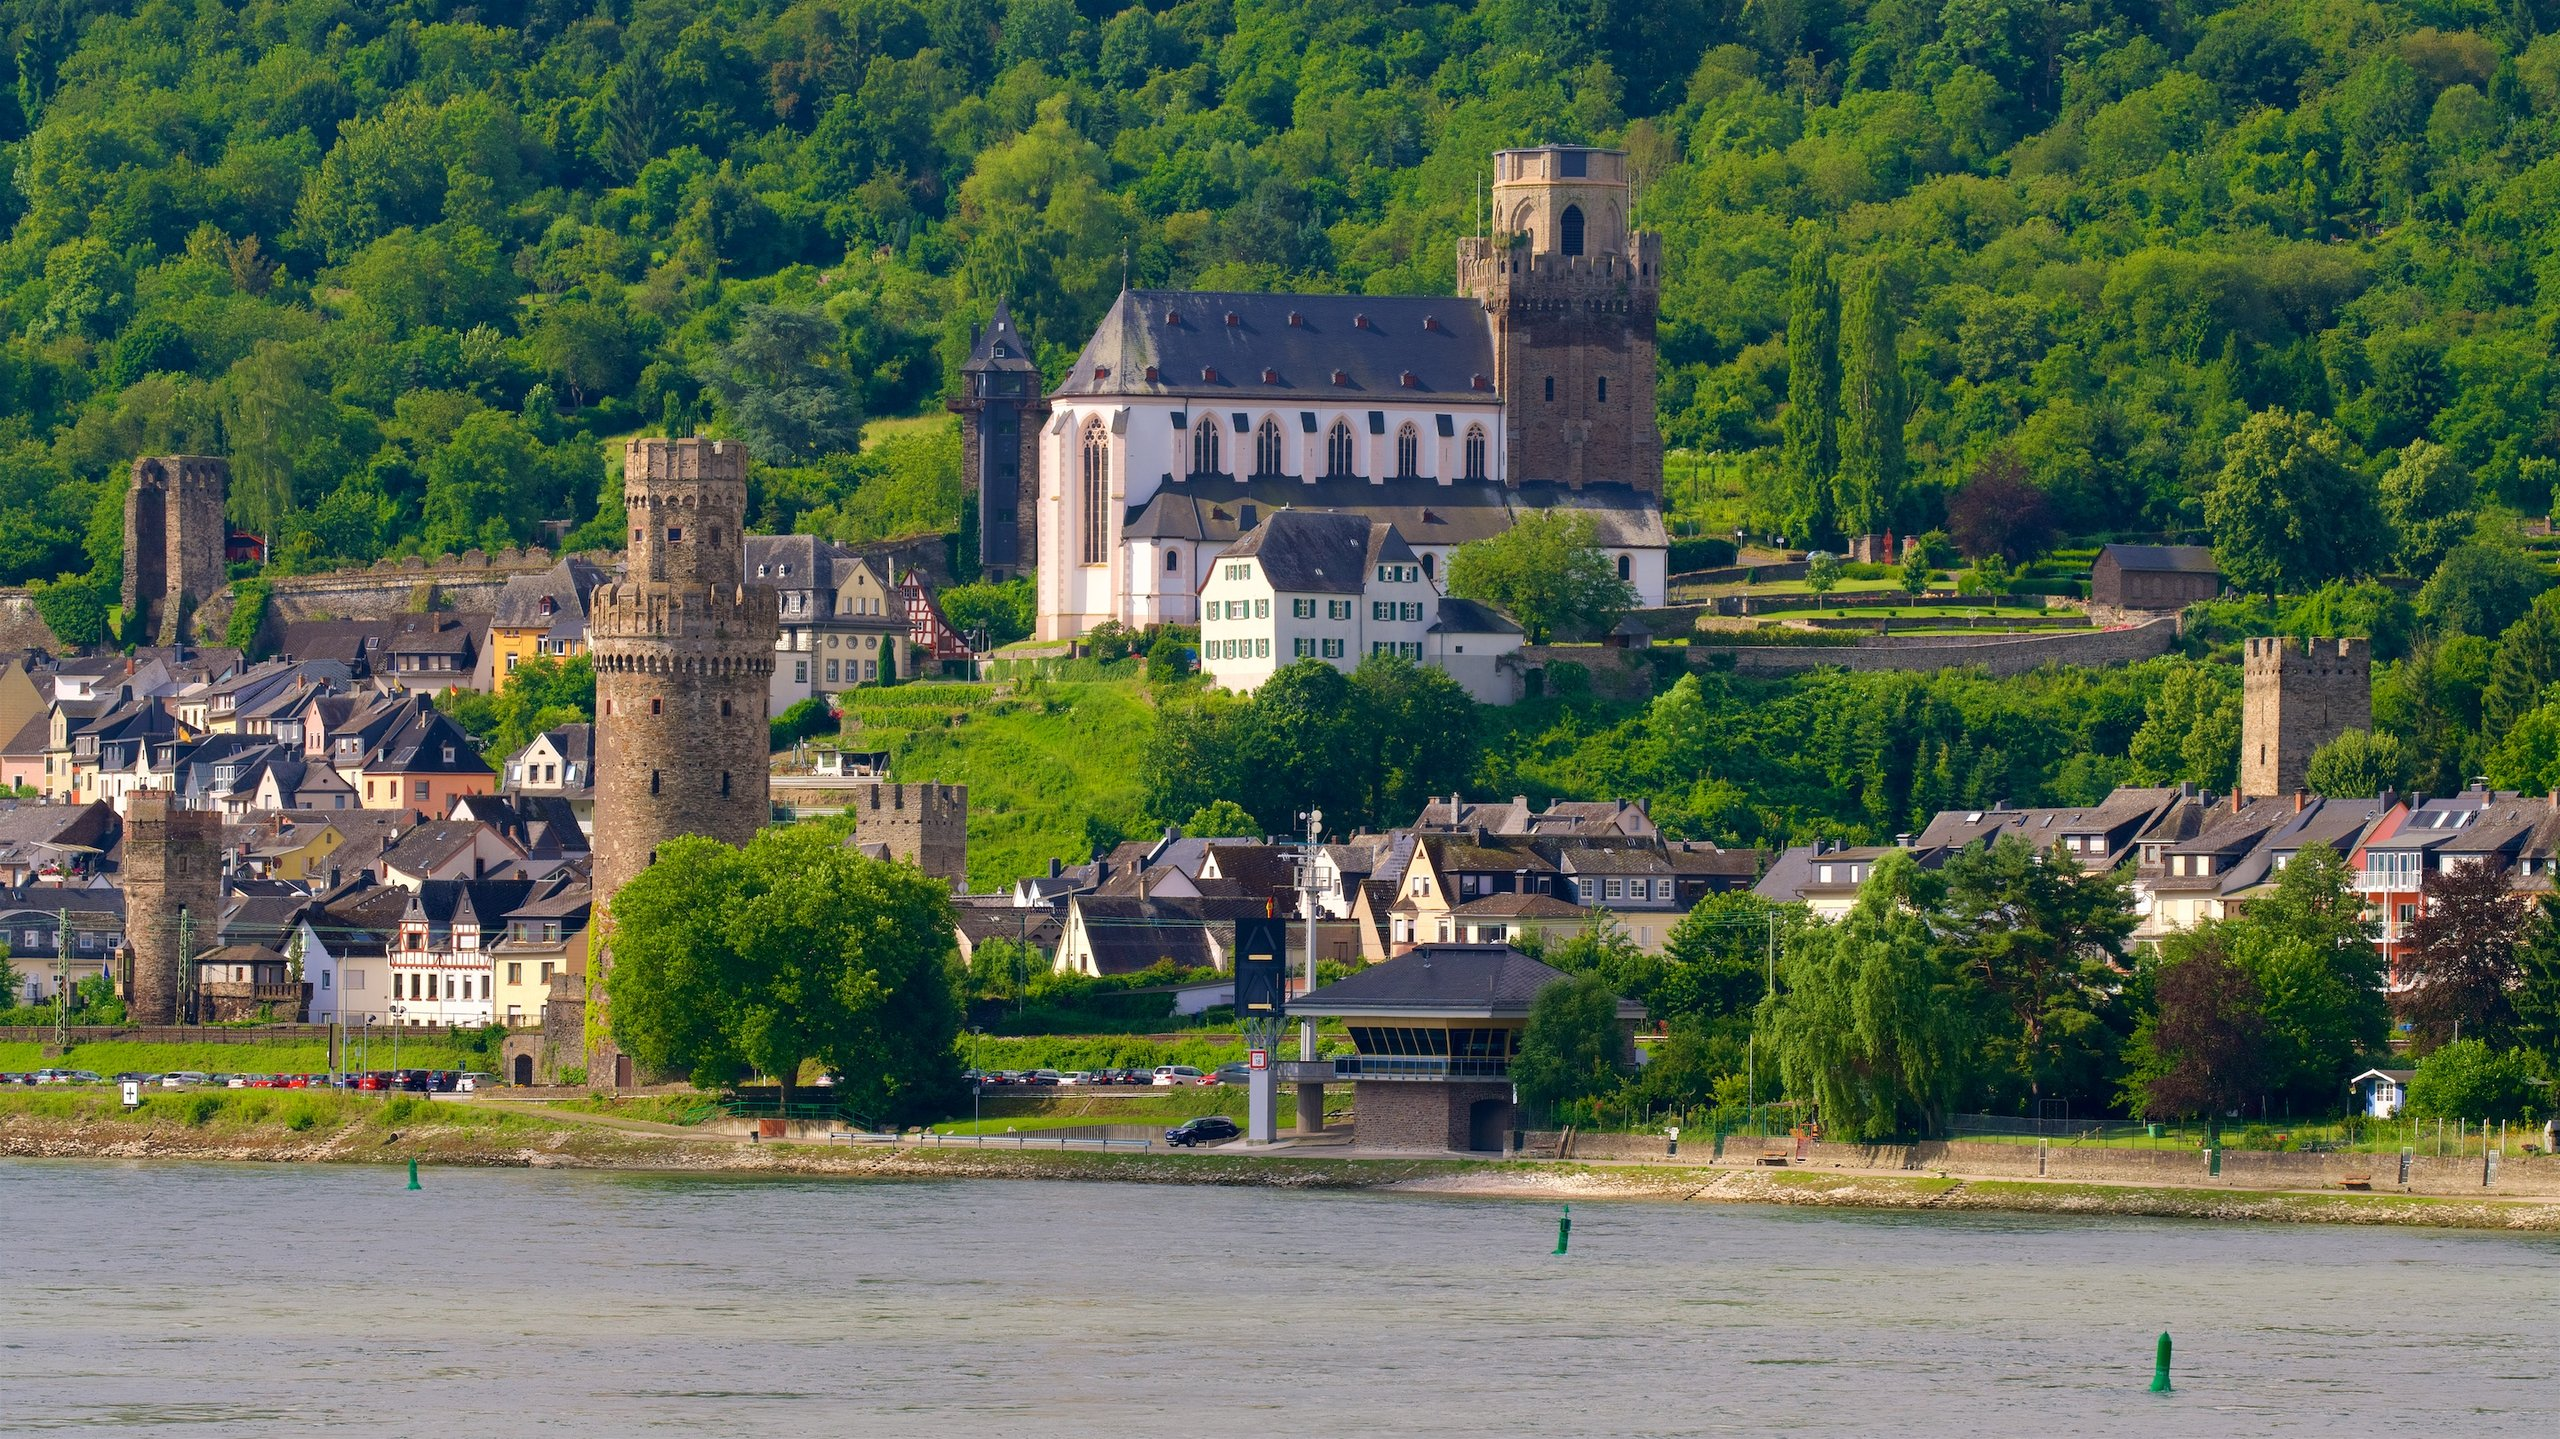 Oberwesel, Rhineland-Palatinate, Germany